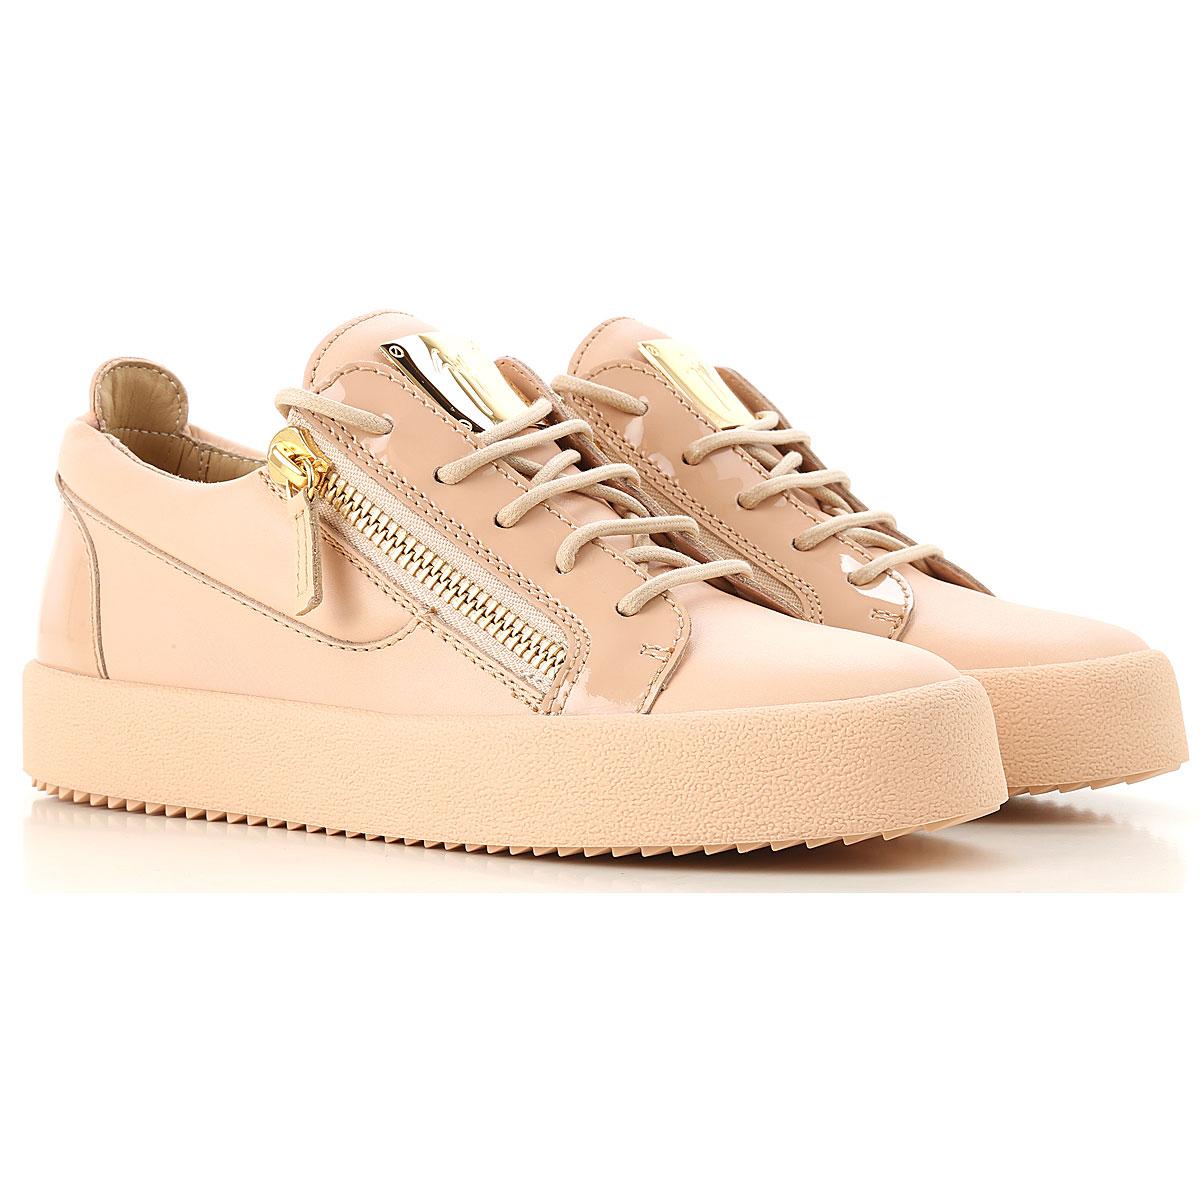 Giuseppe Zanotti Design Sneakers for Women, Nude Pink, Leather, 2017, 5 6 7 8 9 USA-474694